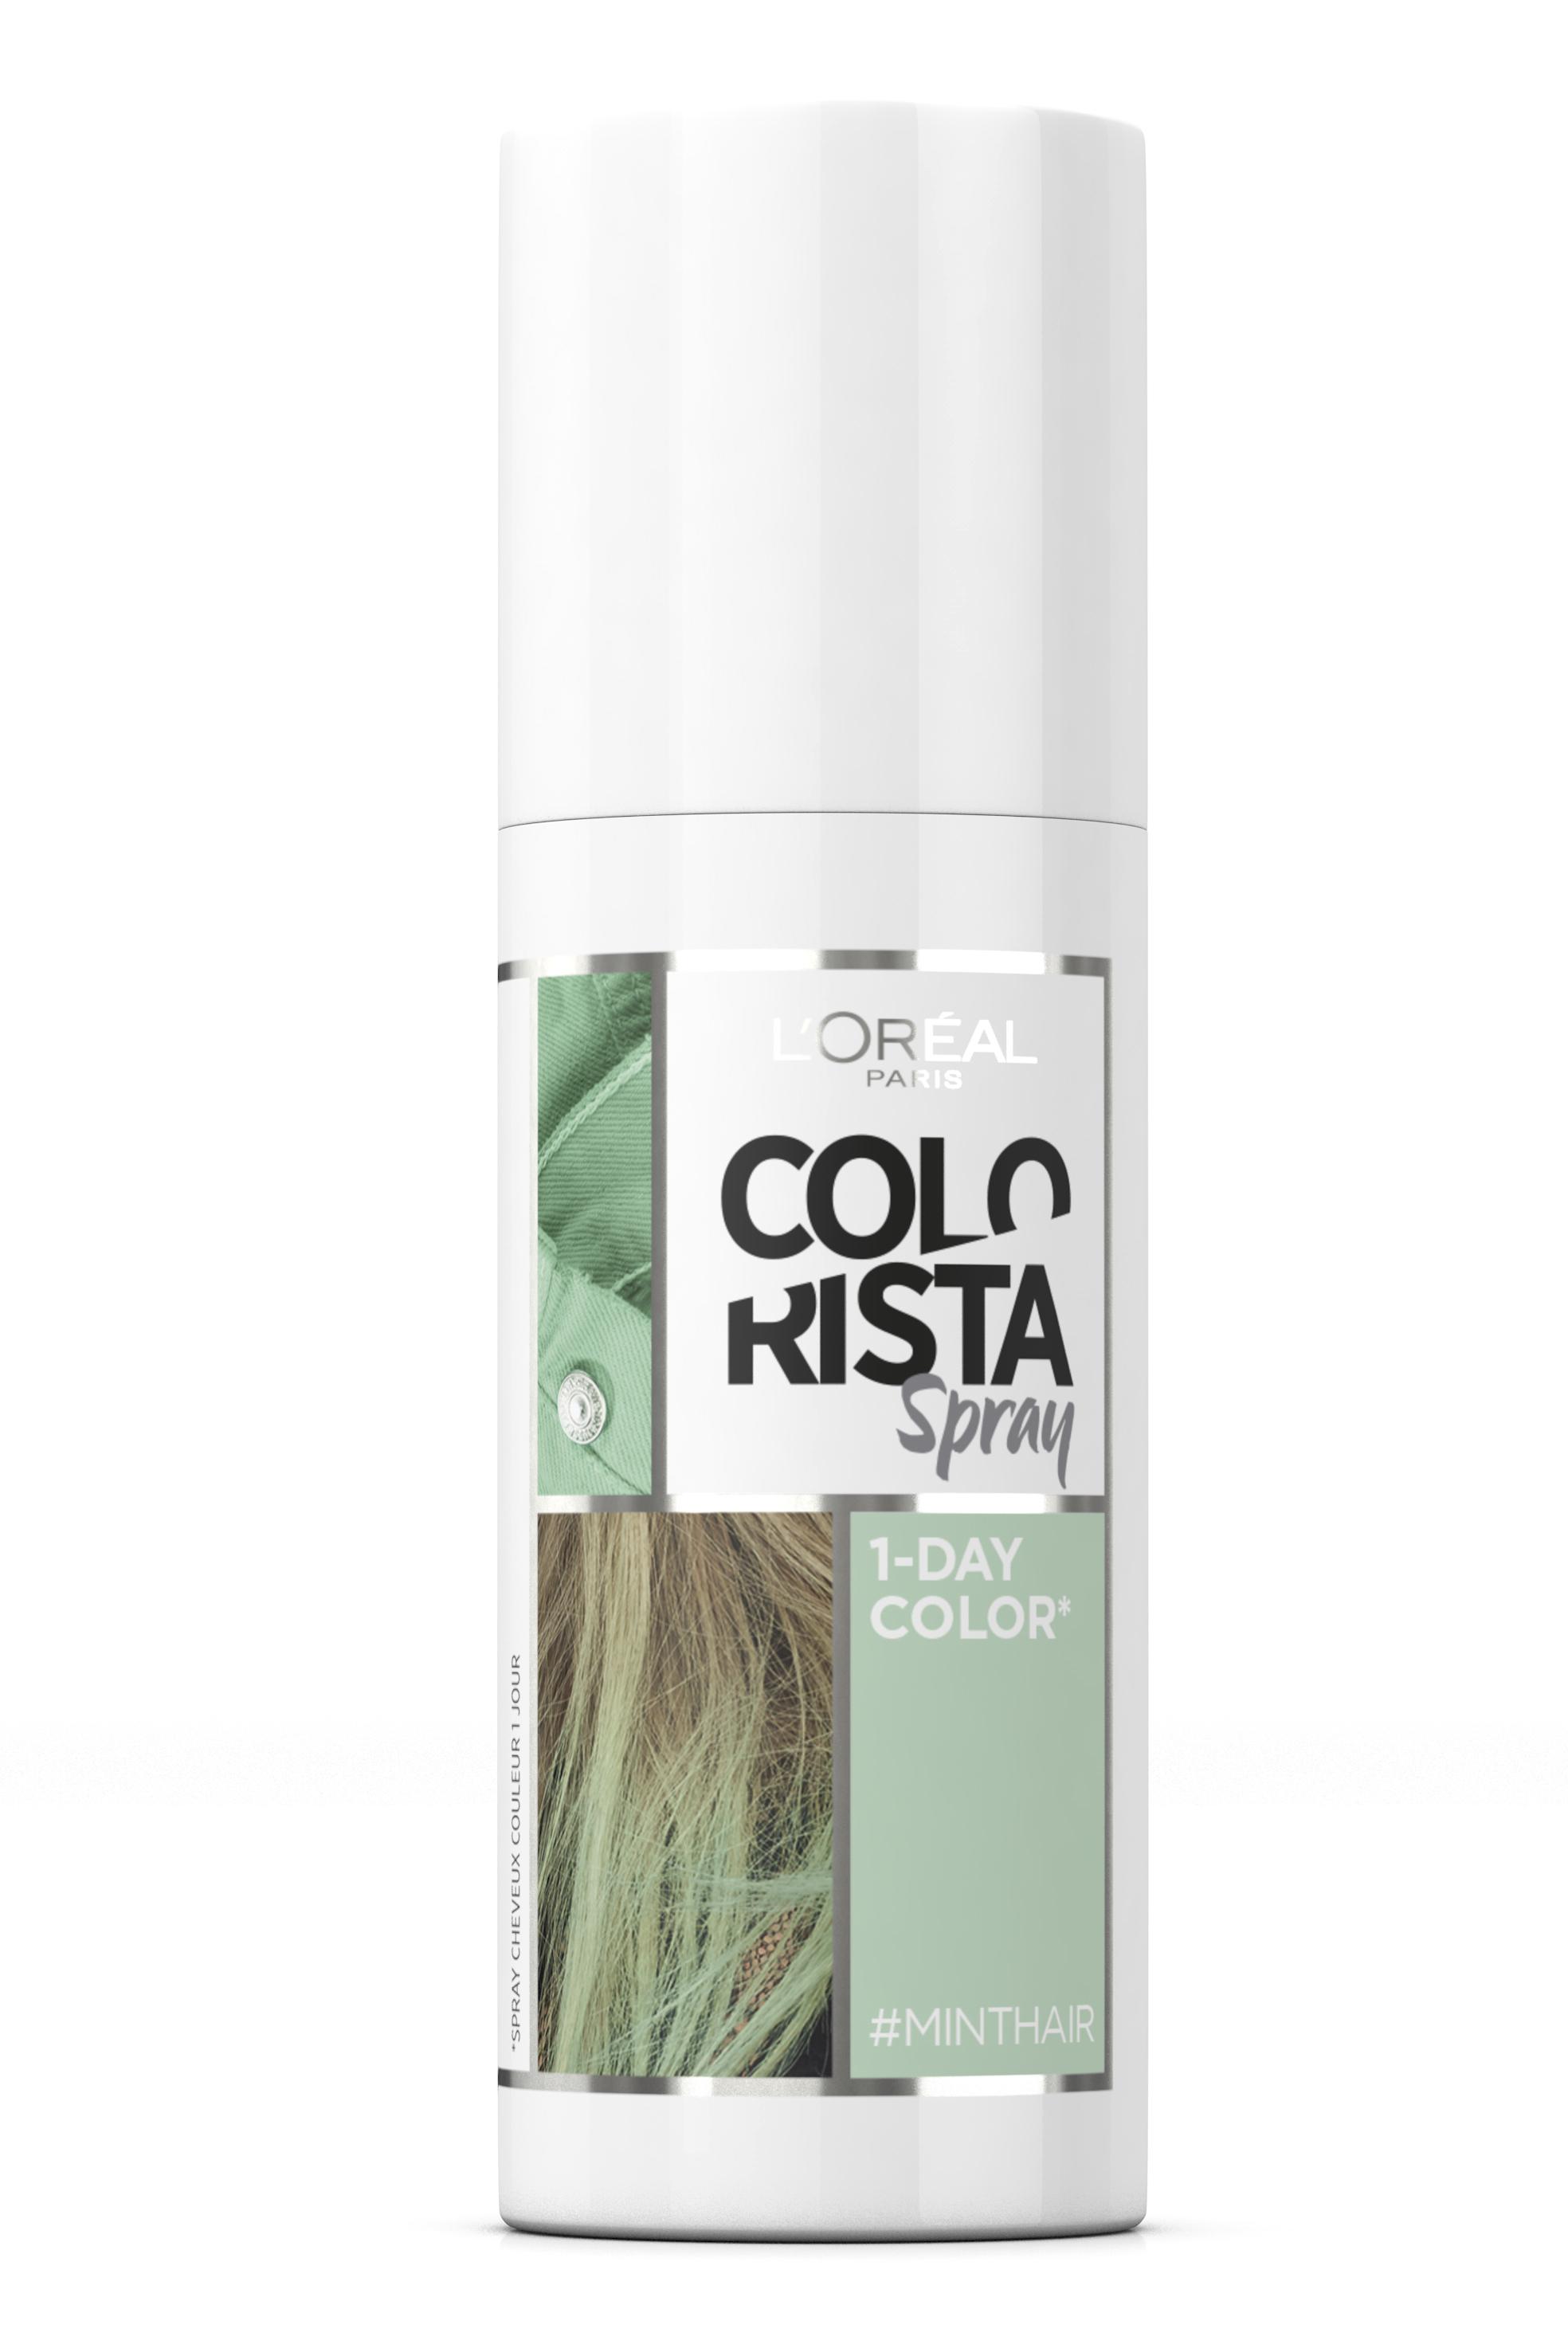 Spray de la línea Colorista de L'Oréal Paris.